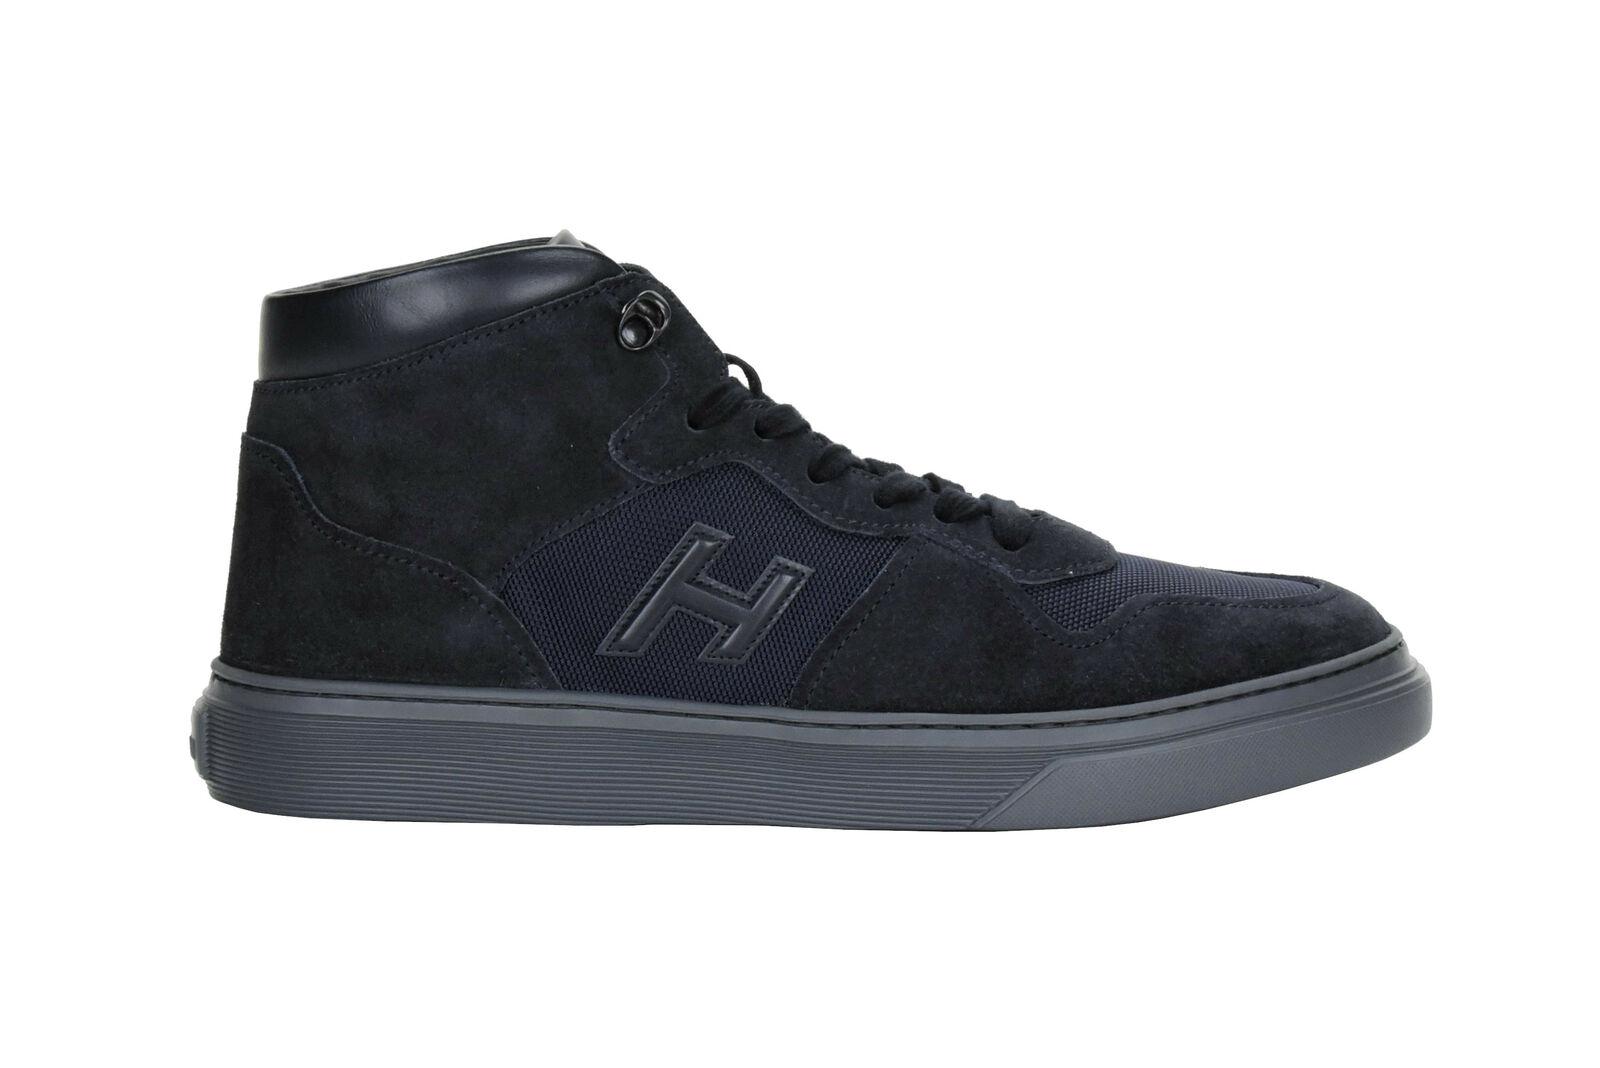 Hogan Baloncesto Denim H365 Zapatos de Hombre Men's Zapatos W9.ho07